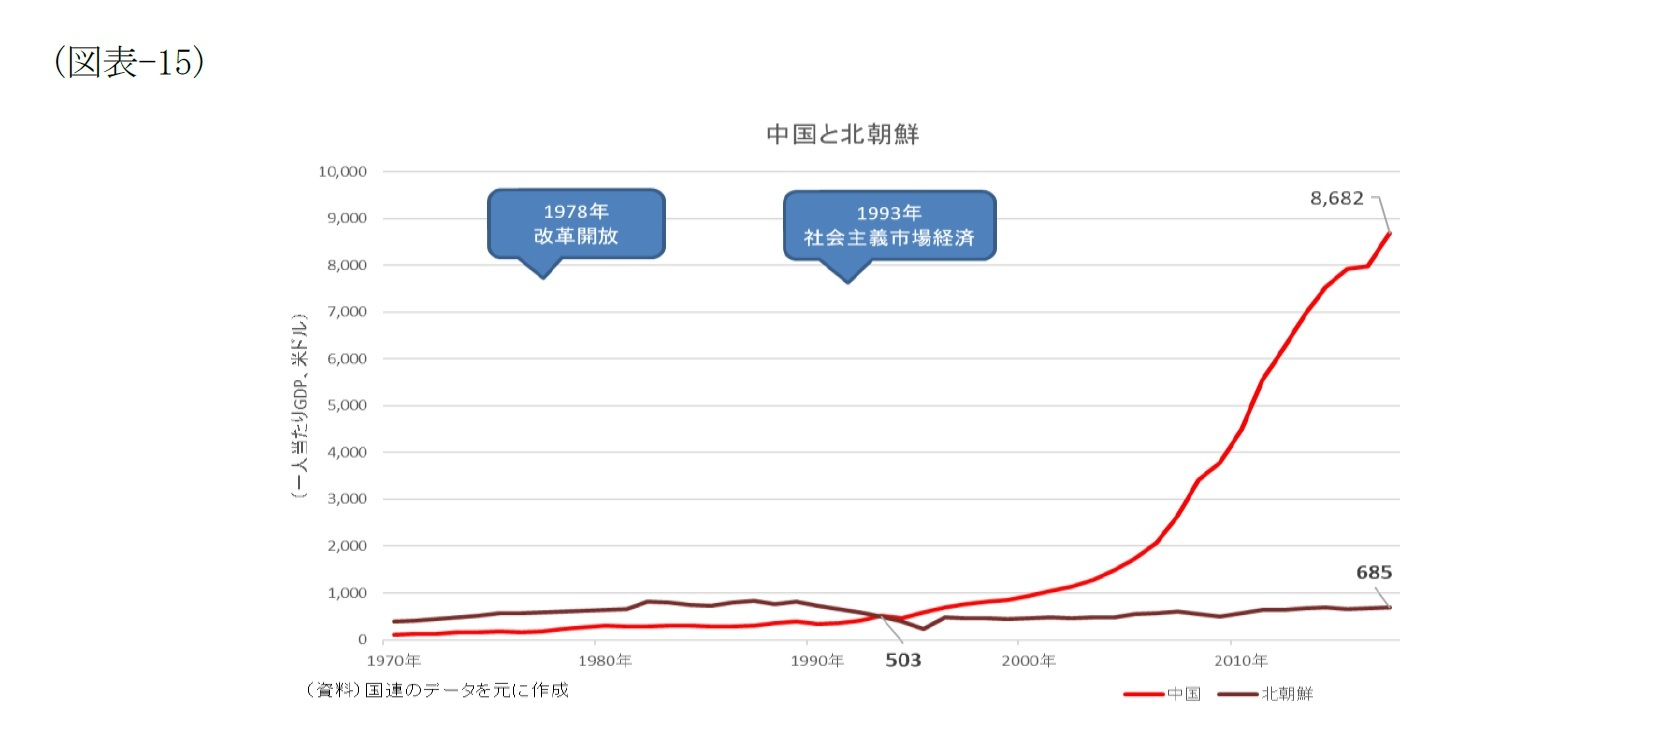 (図表-15)中国と北朝鮮